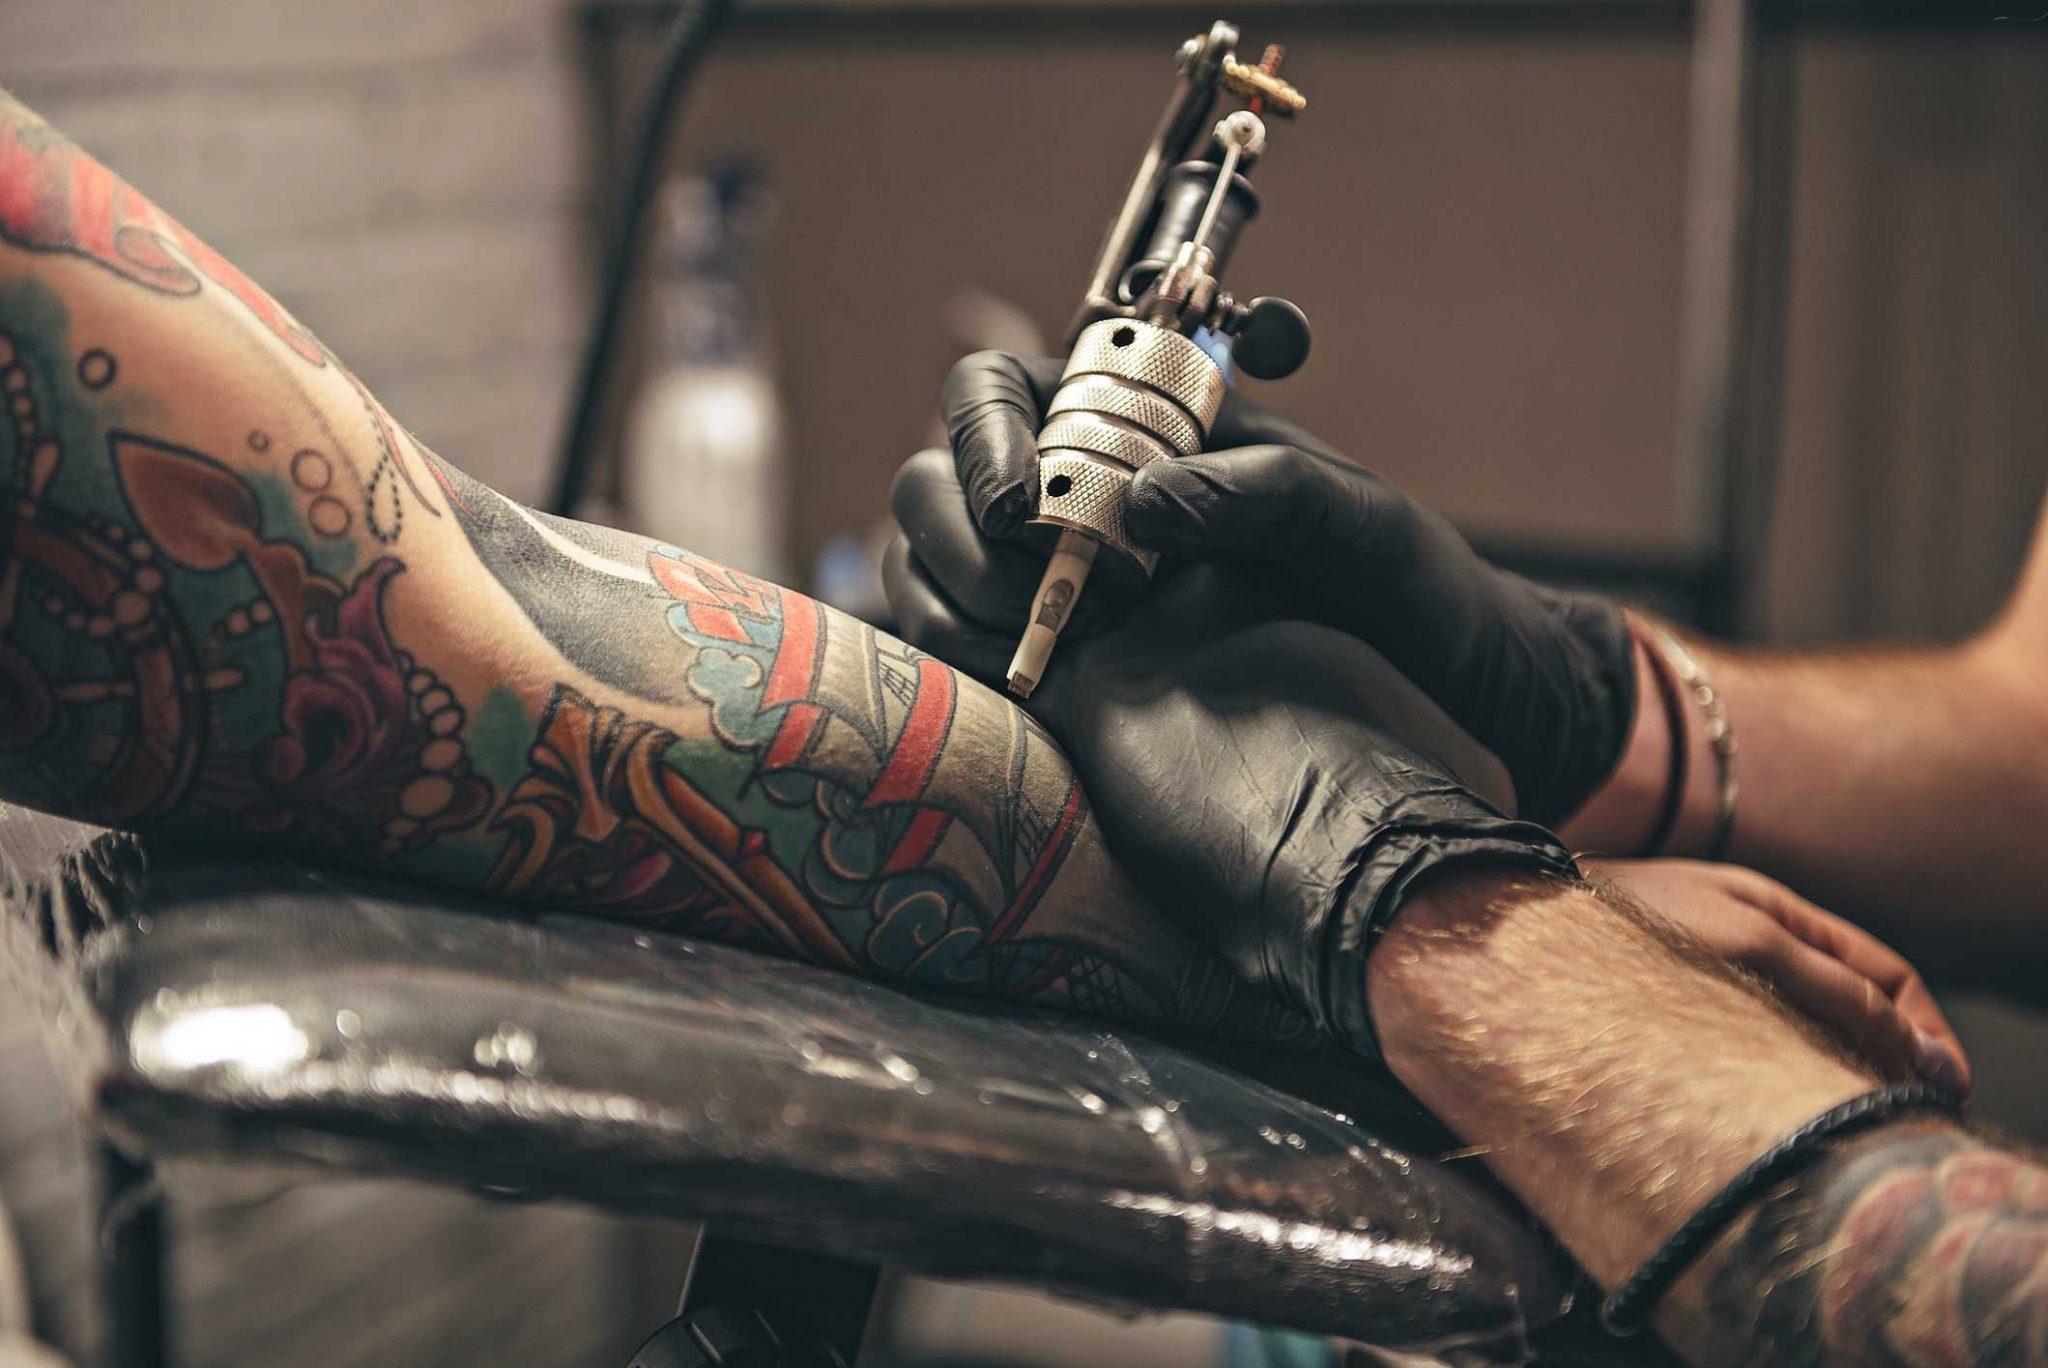 Tattoos and Diabetes